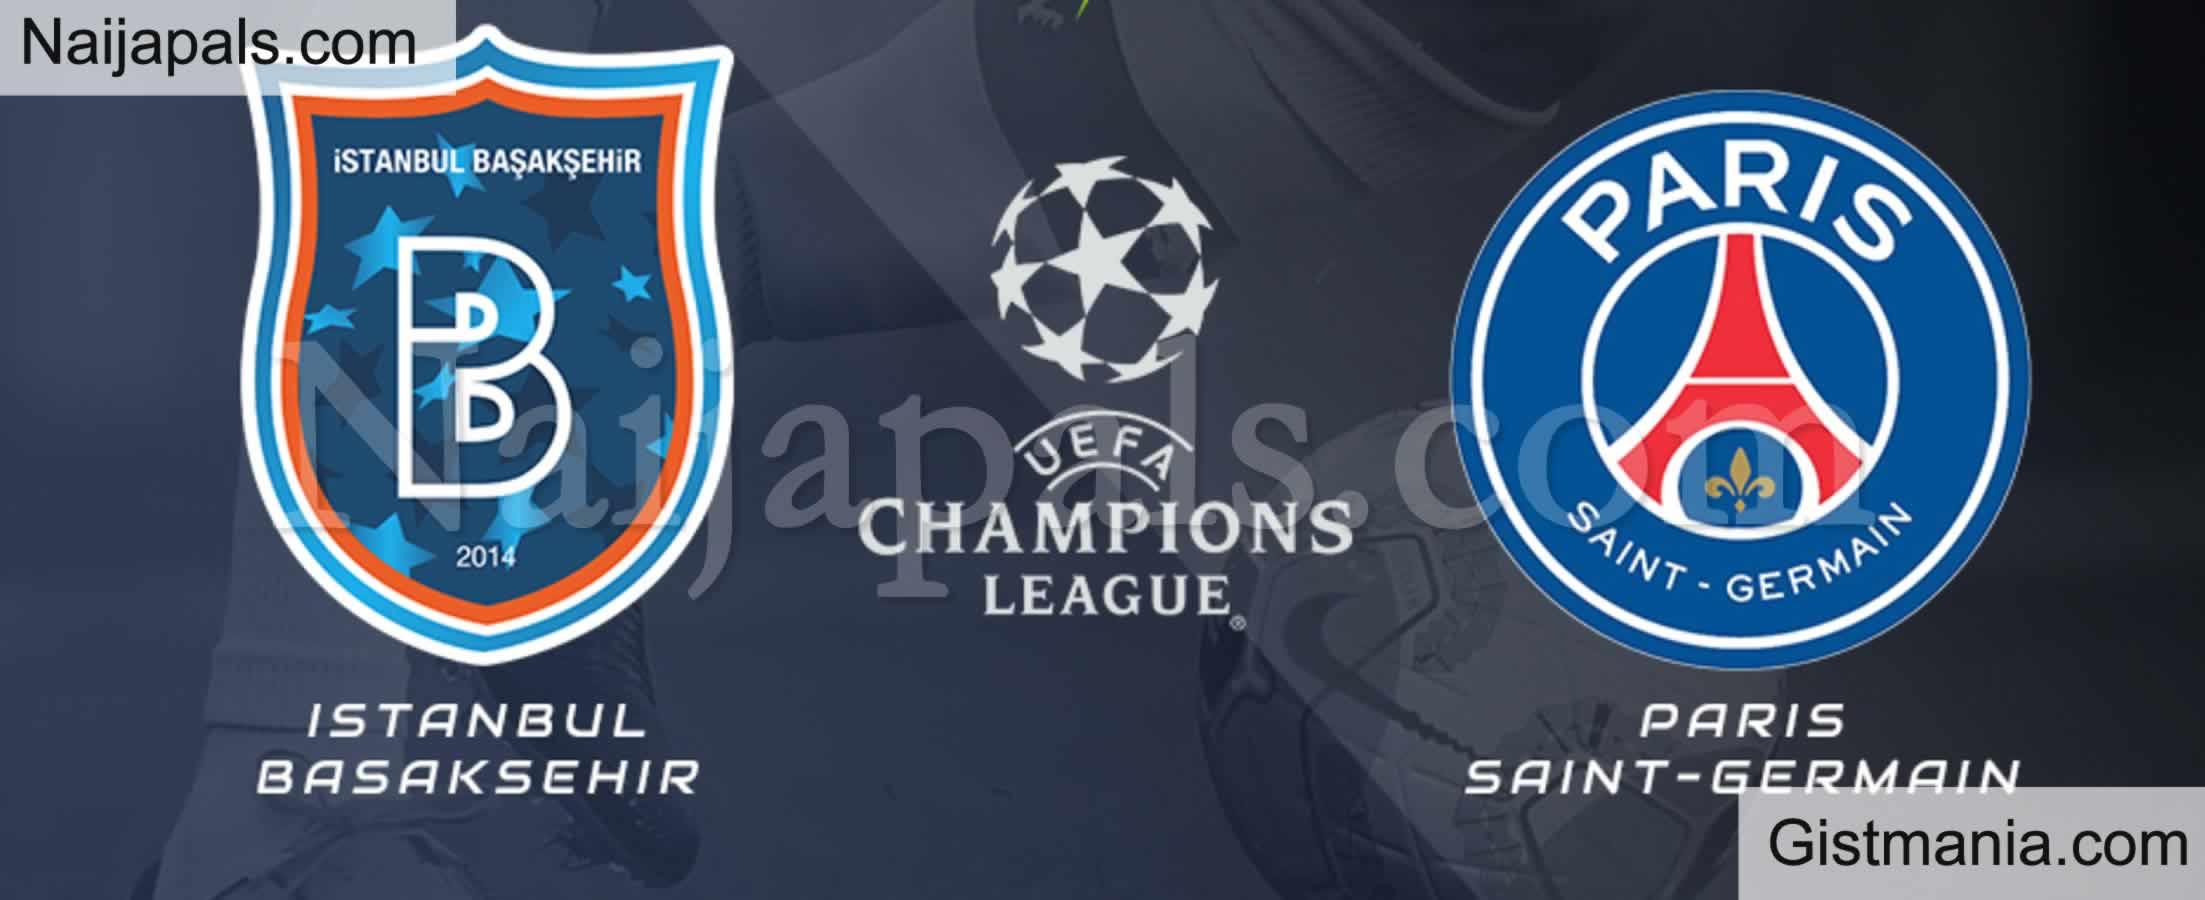 <img alt='.' class='lazyload' data-src='https://img.gistmania.com/emot/soccer.gif' /> <b>Istanbul Basaksehir v PSG : UEFA Champions League Match, Team News, Goal Scorers and Stats</b>